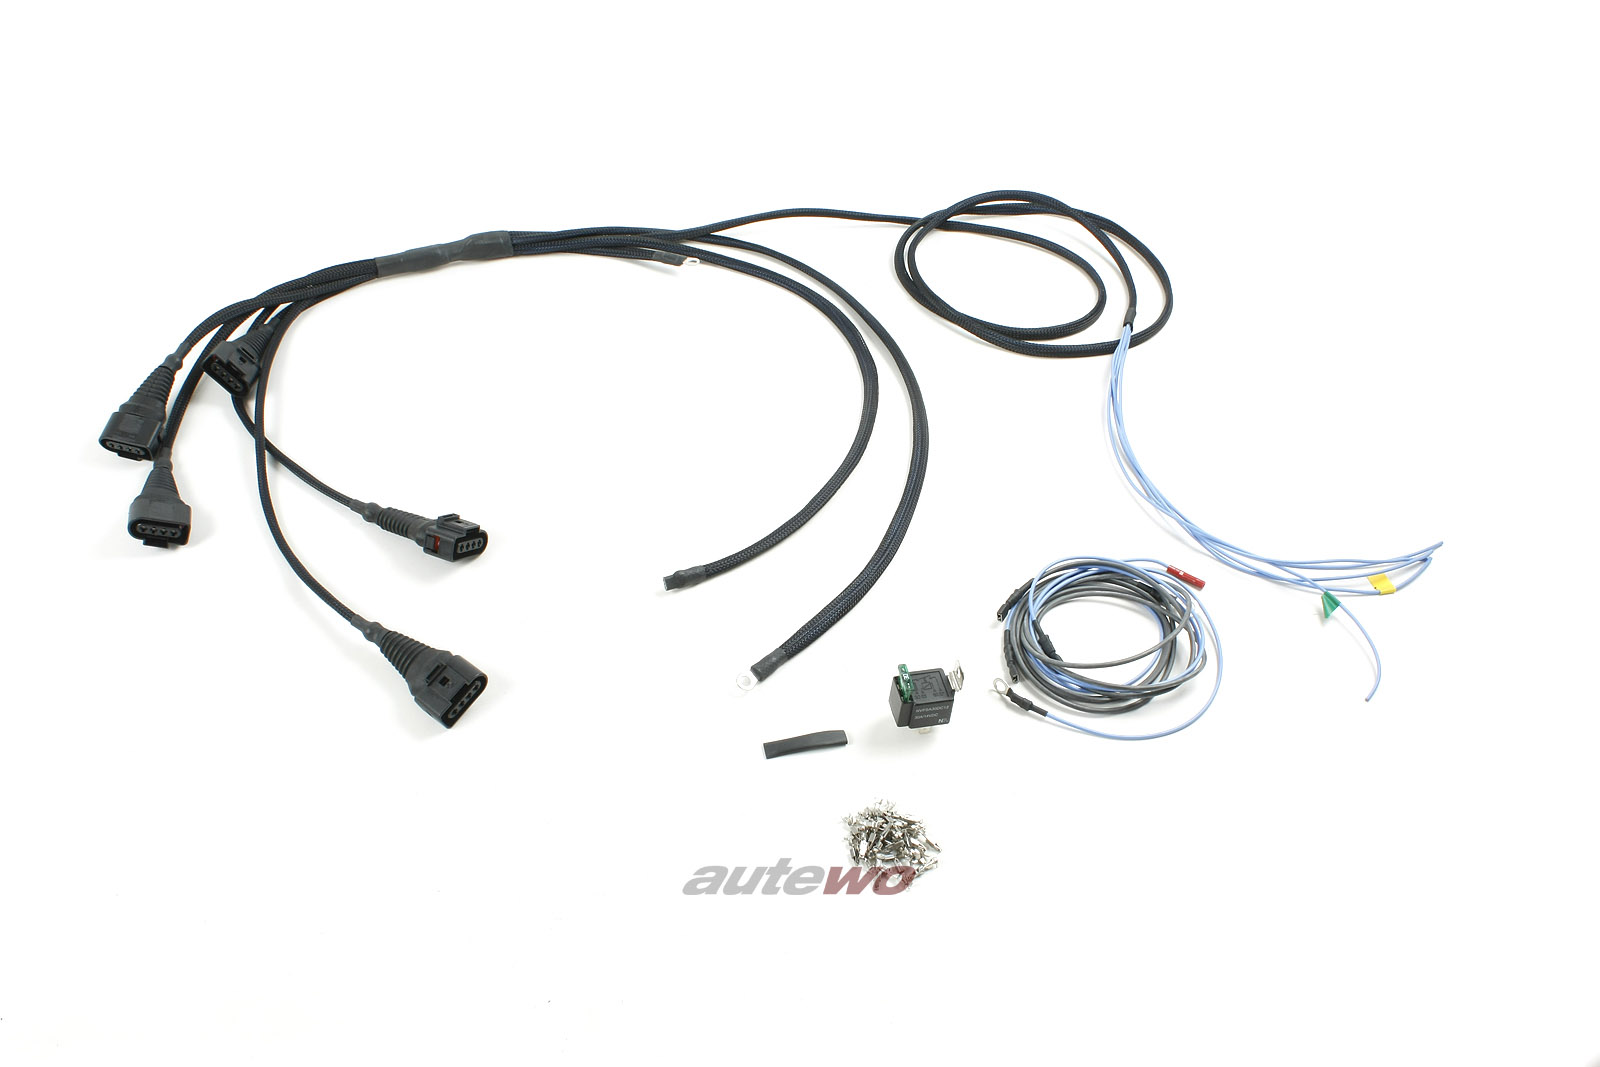 NEU Audi 200 20V Turbo/S2 Coupe 89/Urquattro RR/3B